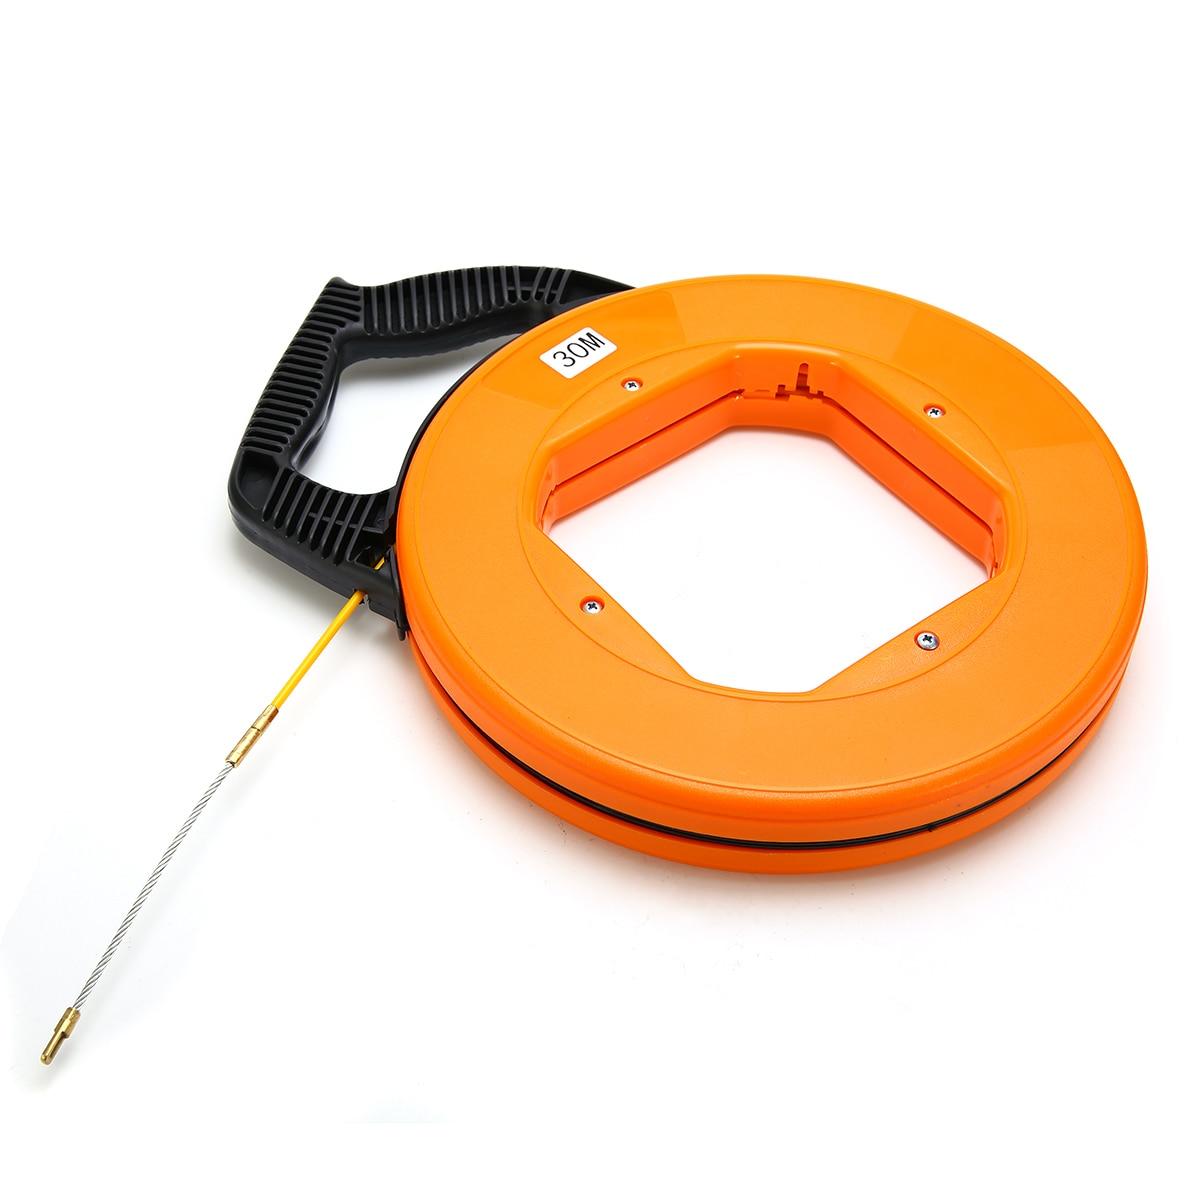 New Cable Fish Tape ABS Plastic Fish Tape Puller 30M Fiberglass Fish Tape Reel Puller Conduit